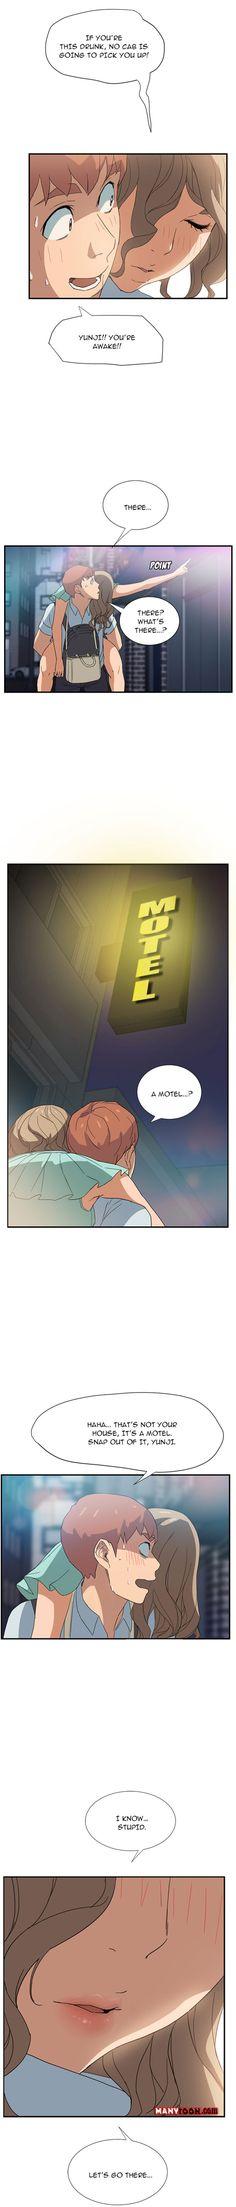 My Stepmom Manhwa - Chapter 5 - ManyToon Comics Pdf, Read Comics, Read Manga Online Free, My Step Mom, Married Woman, 10 Year Old, Manga To Read, Webtoon, Manhwa